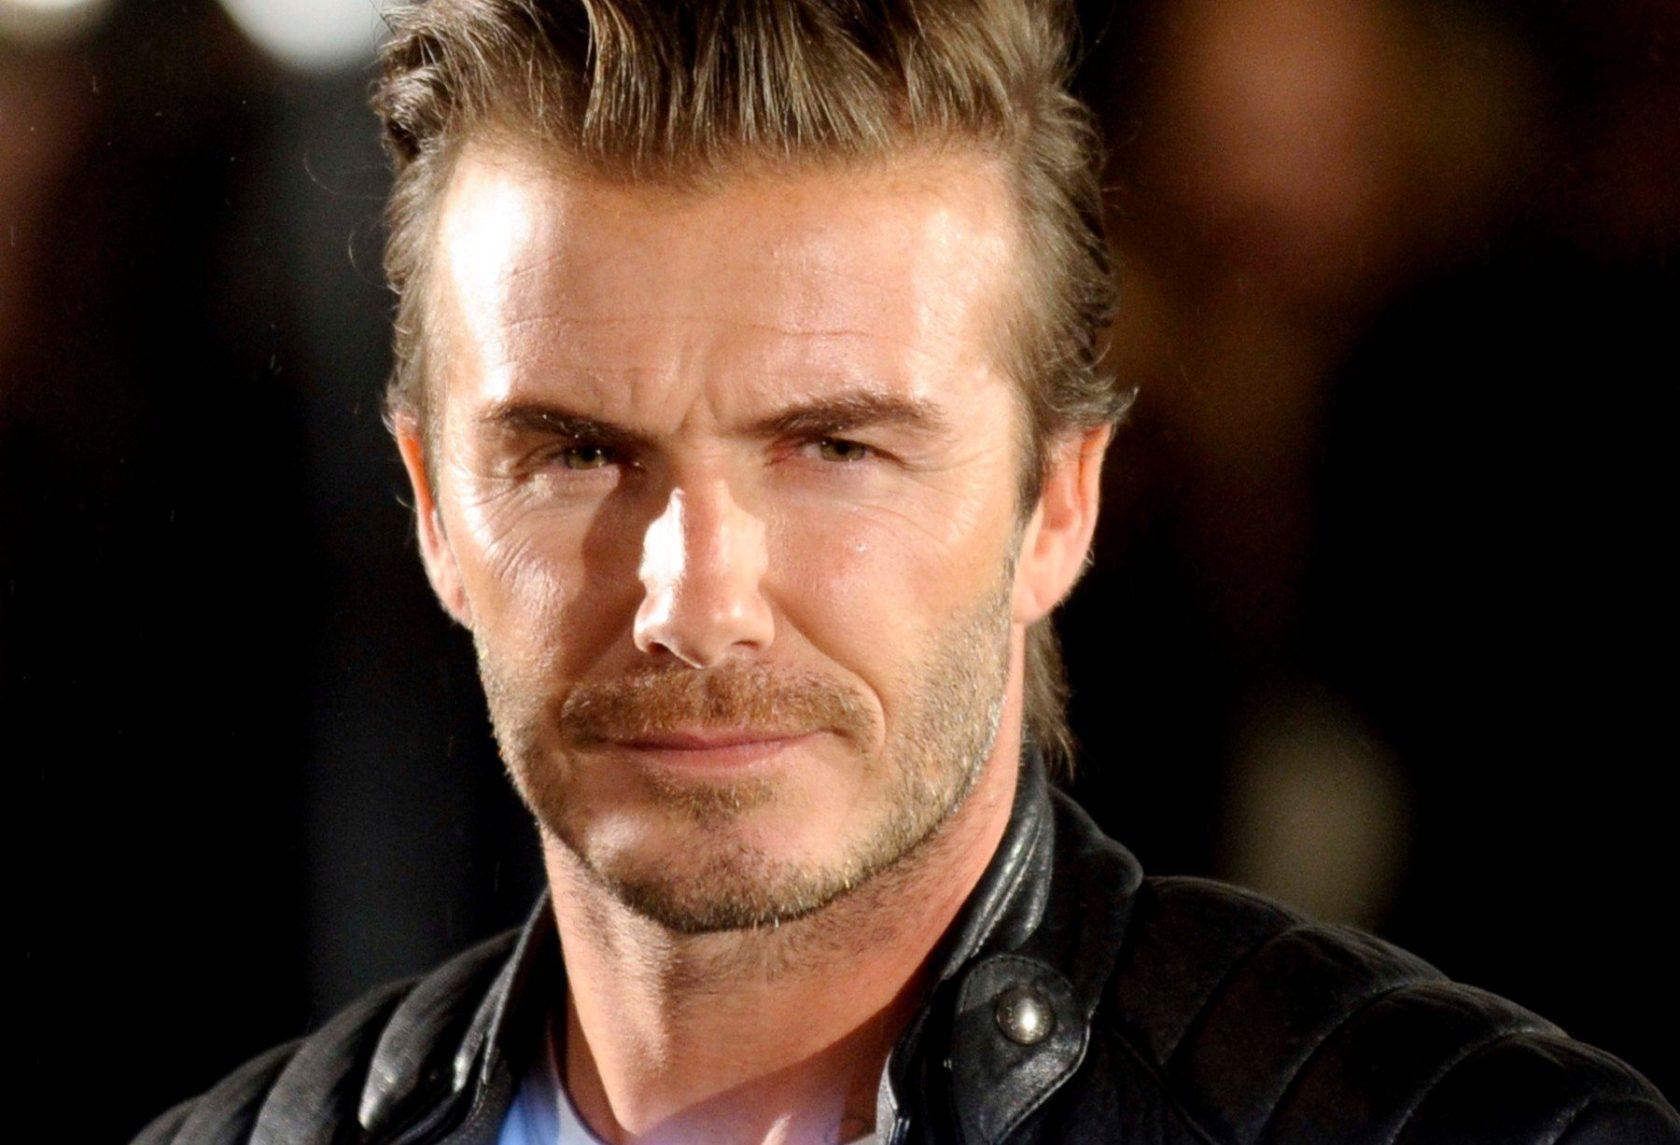 David Beckham attending the Belstaff House Opening Event, New Bond Street, London, UK. 15/09/2013., Image: 172166329, License: Rights-managed, Restrictions: , Model Release: no, Credit line: Profimedia, TEMP Camerapress